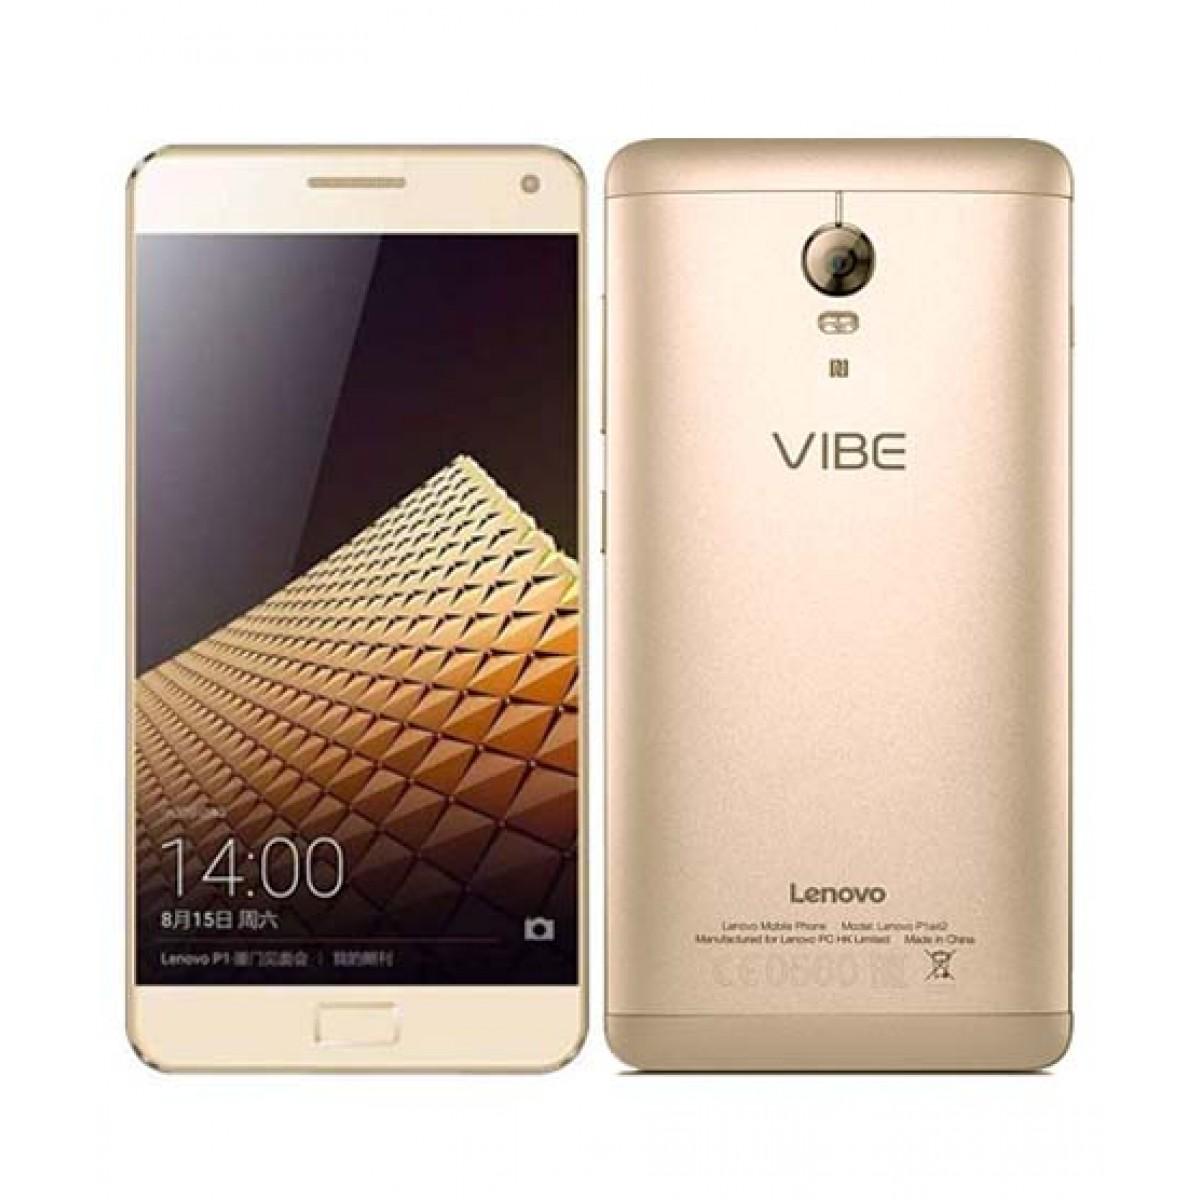 Lenovo Vibe P1 4G Dual Sim Smartphone Gold